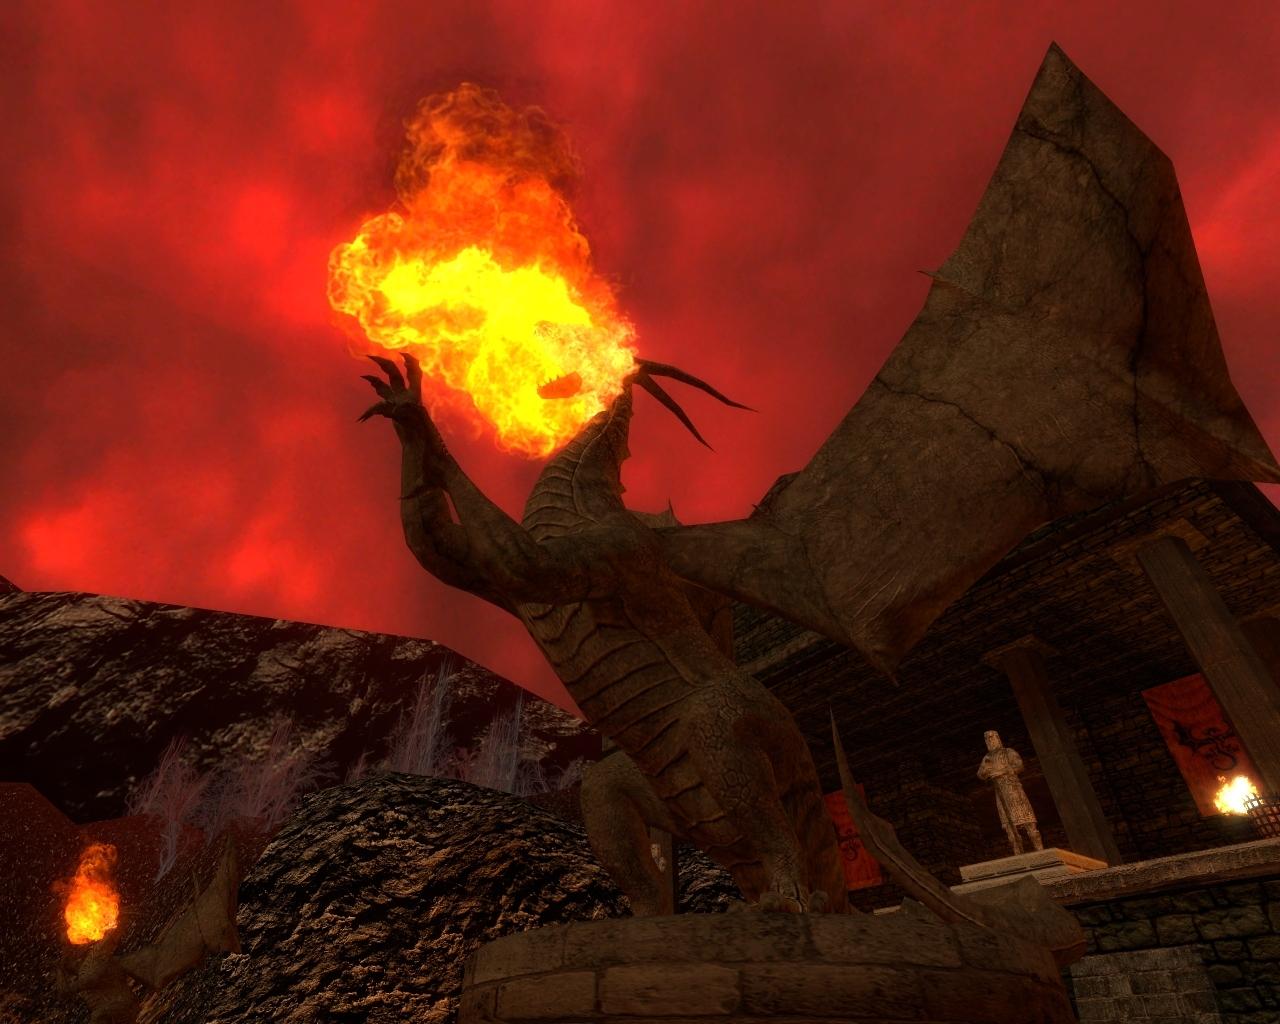 aoc_firecrag.zip.jpg - Half-Life 2 Age of Chivalry